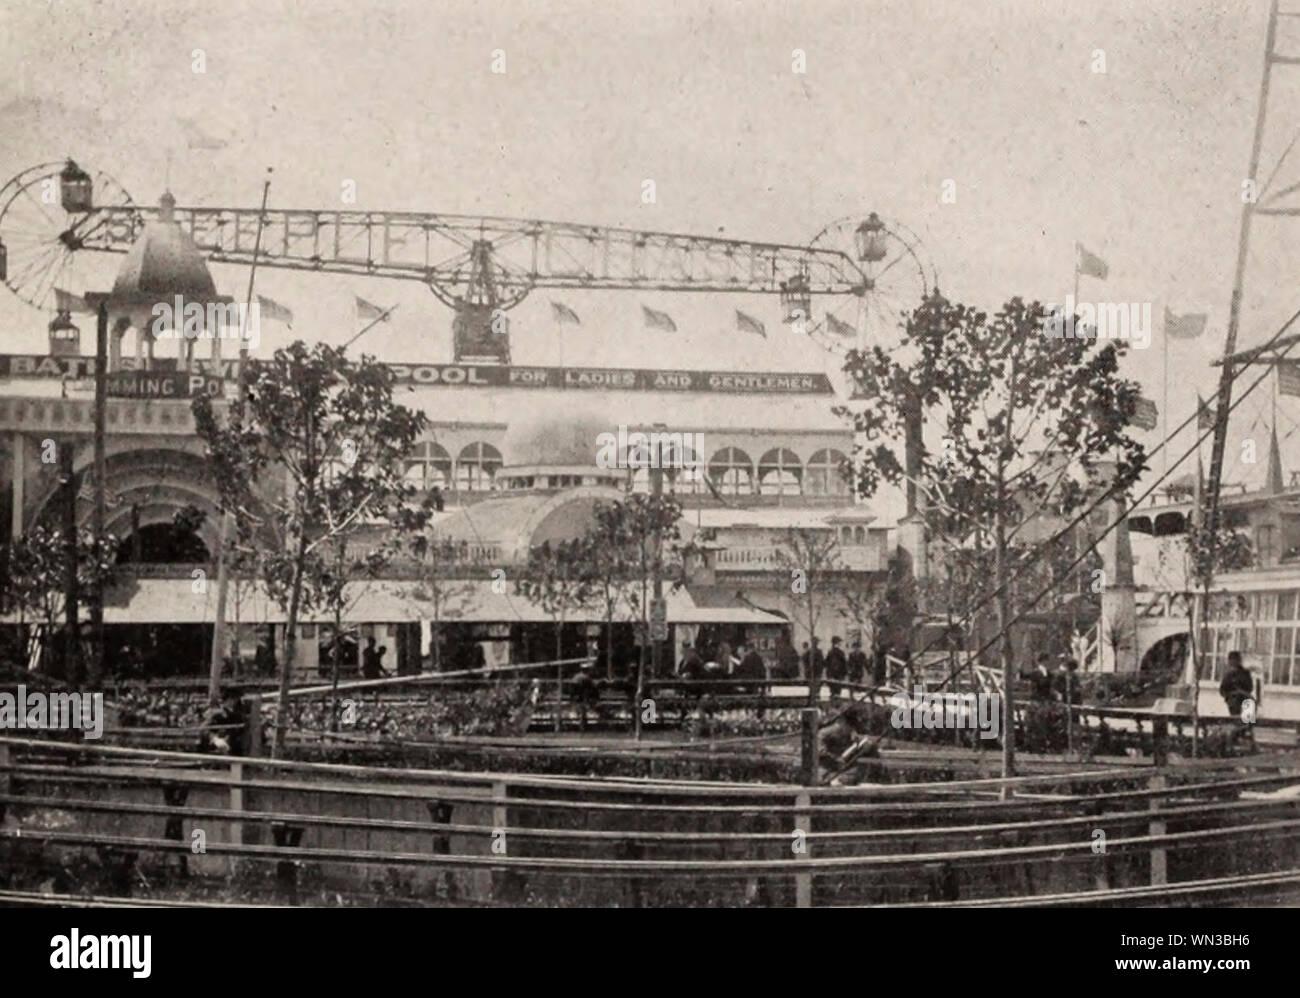 Scene in Steeplechase Park - Coney Island, New York, circa 1904 Stock Photo